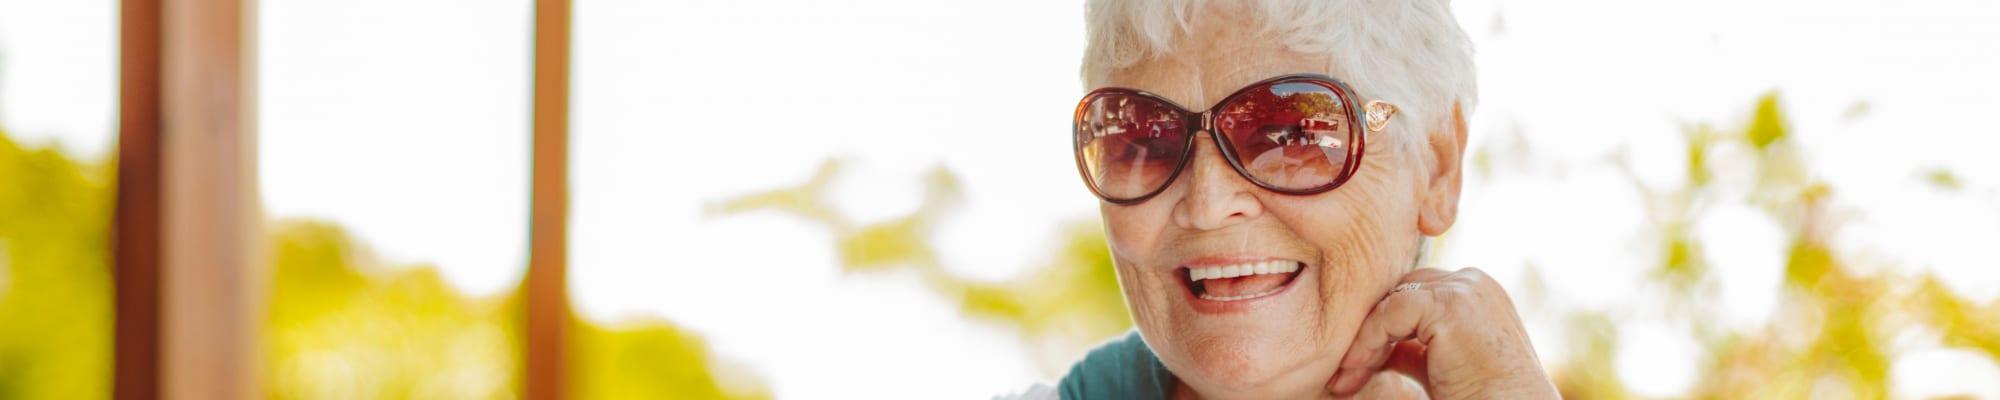 Reviews of Hilliard, Ohio senior living